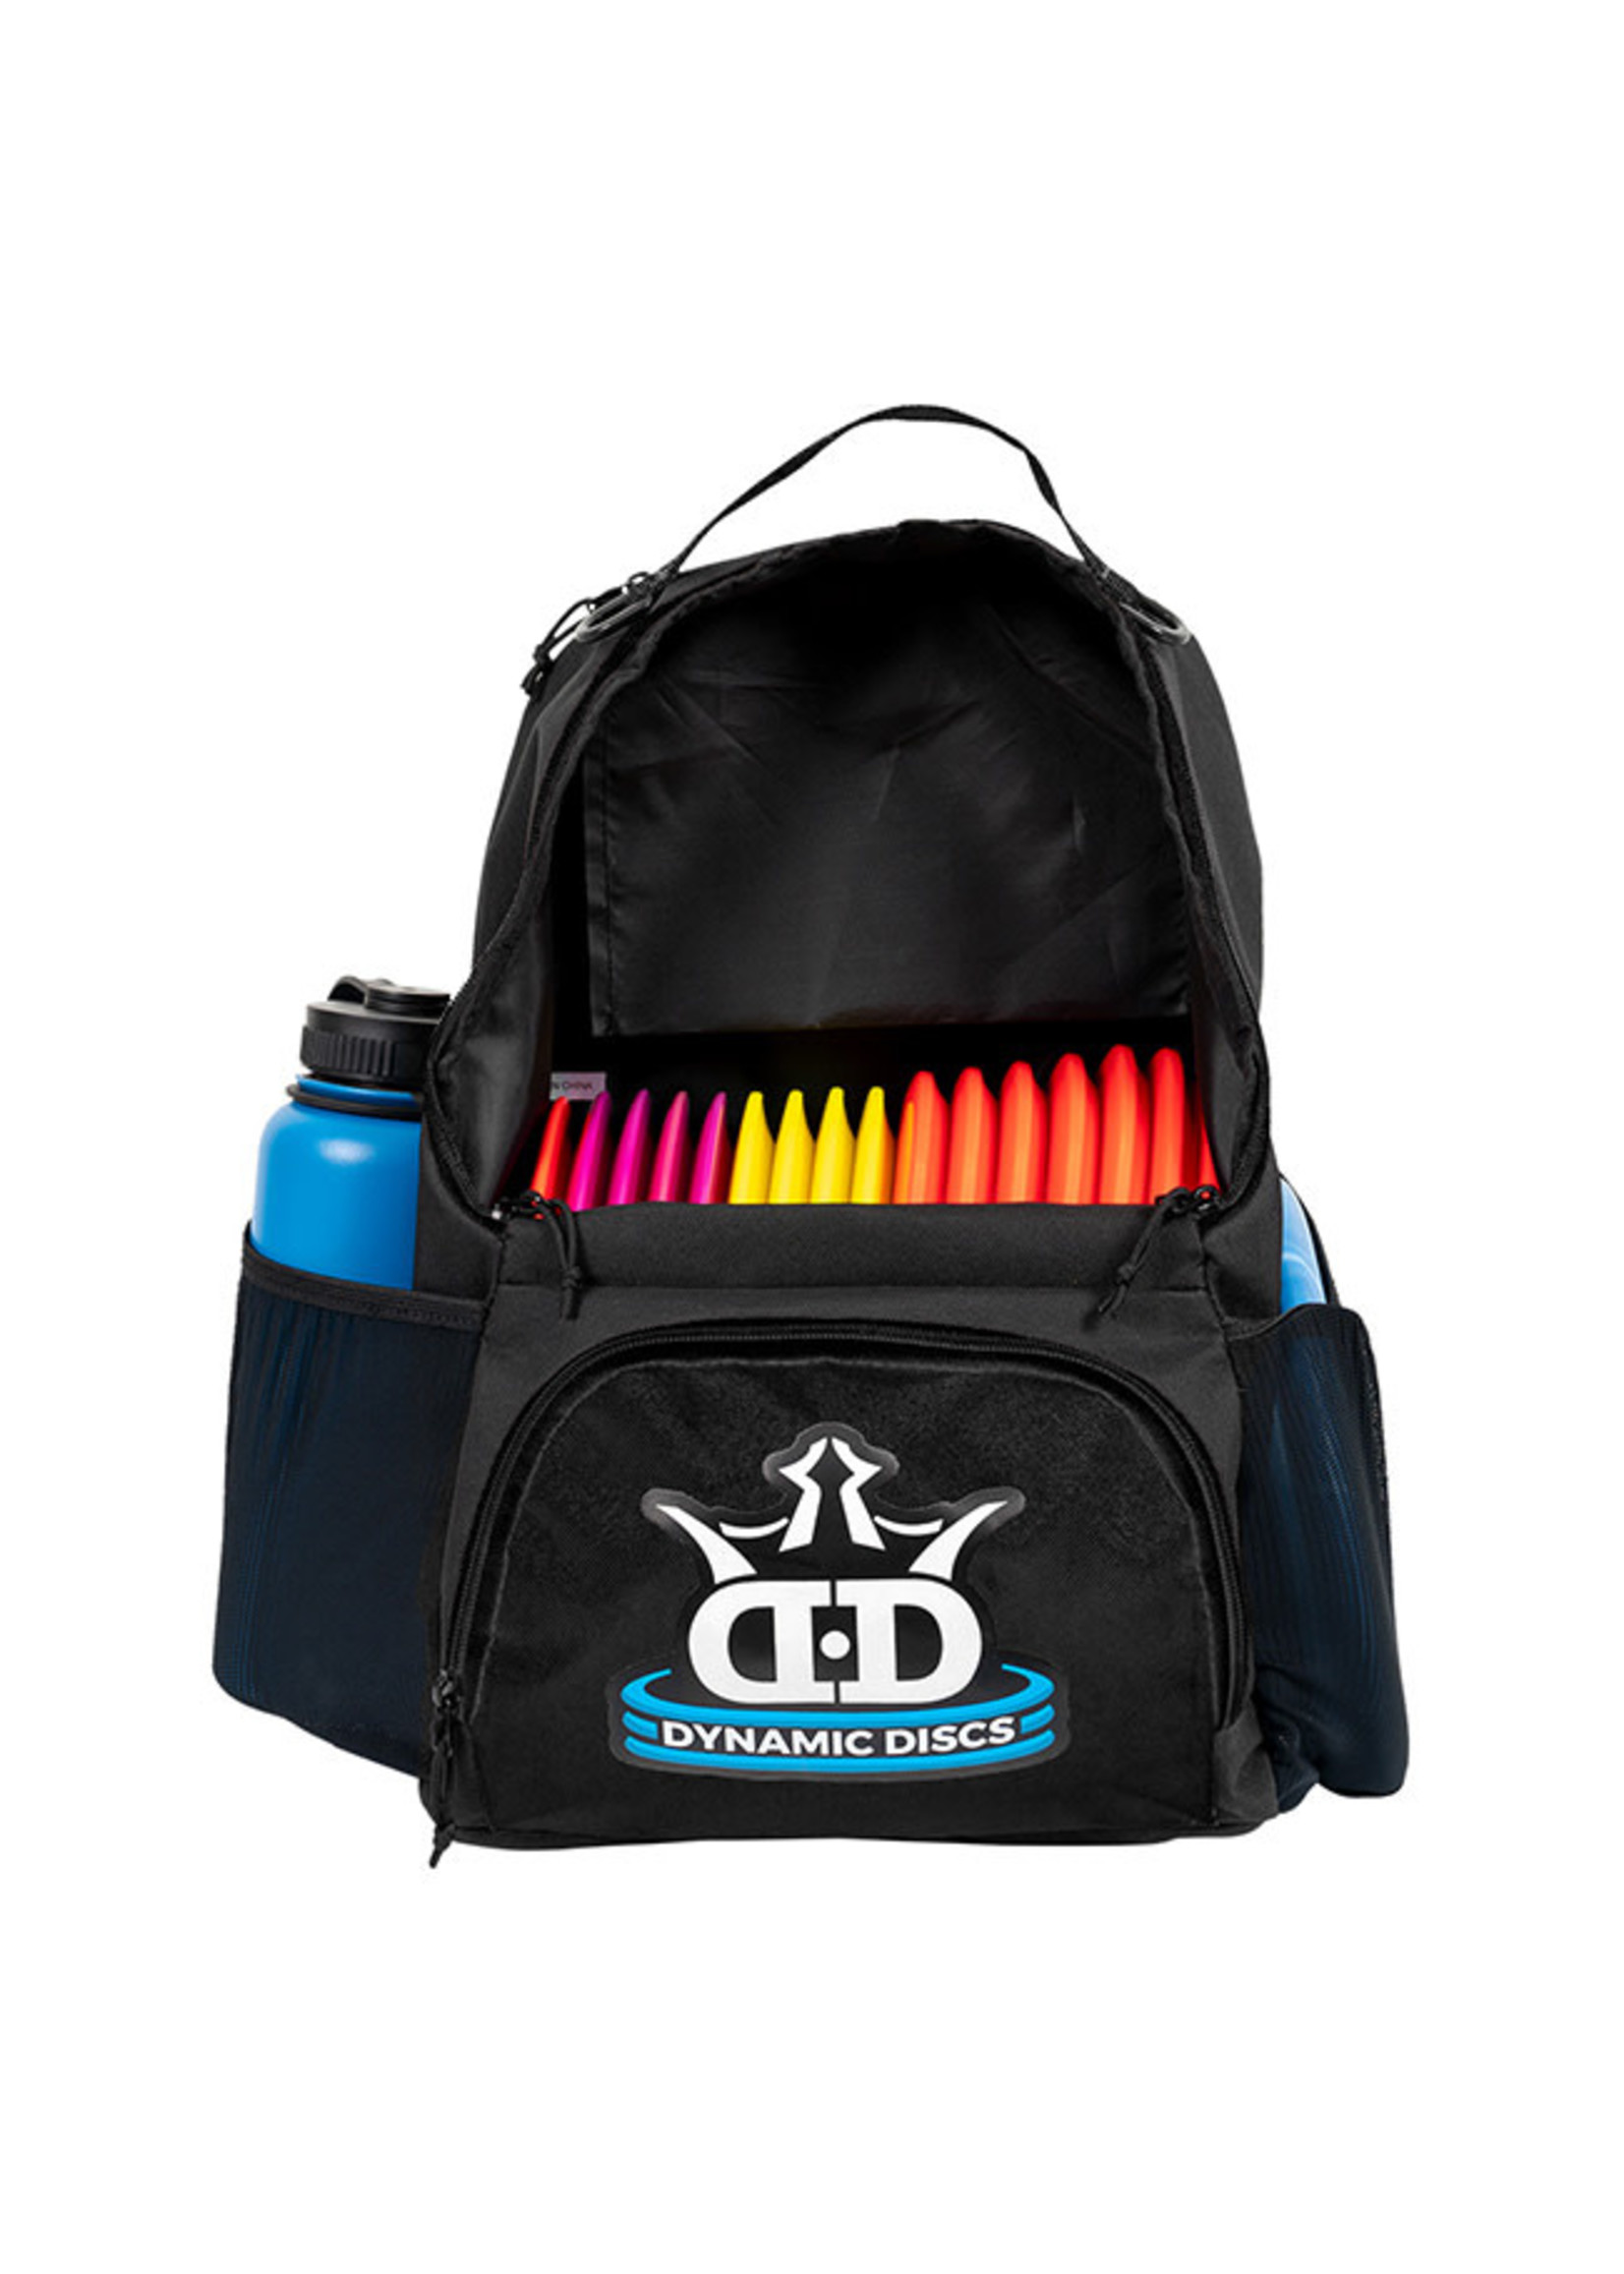 Dynamic Discs Dynamic Discs Cadet Disc Golf Backpack